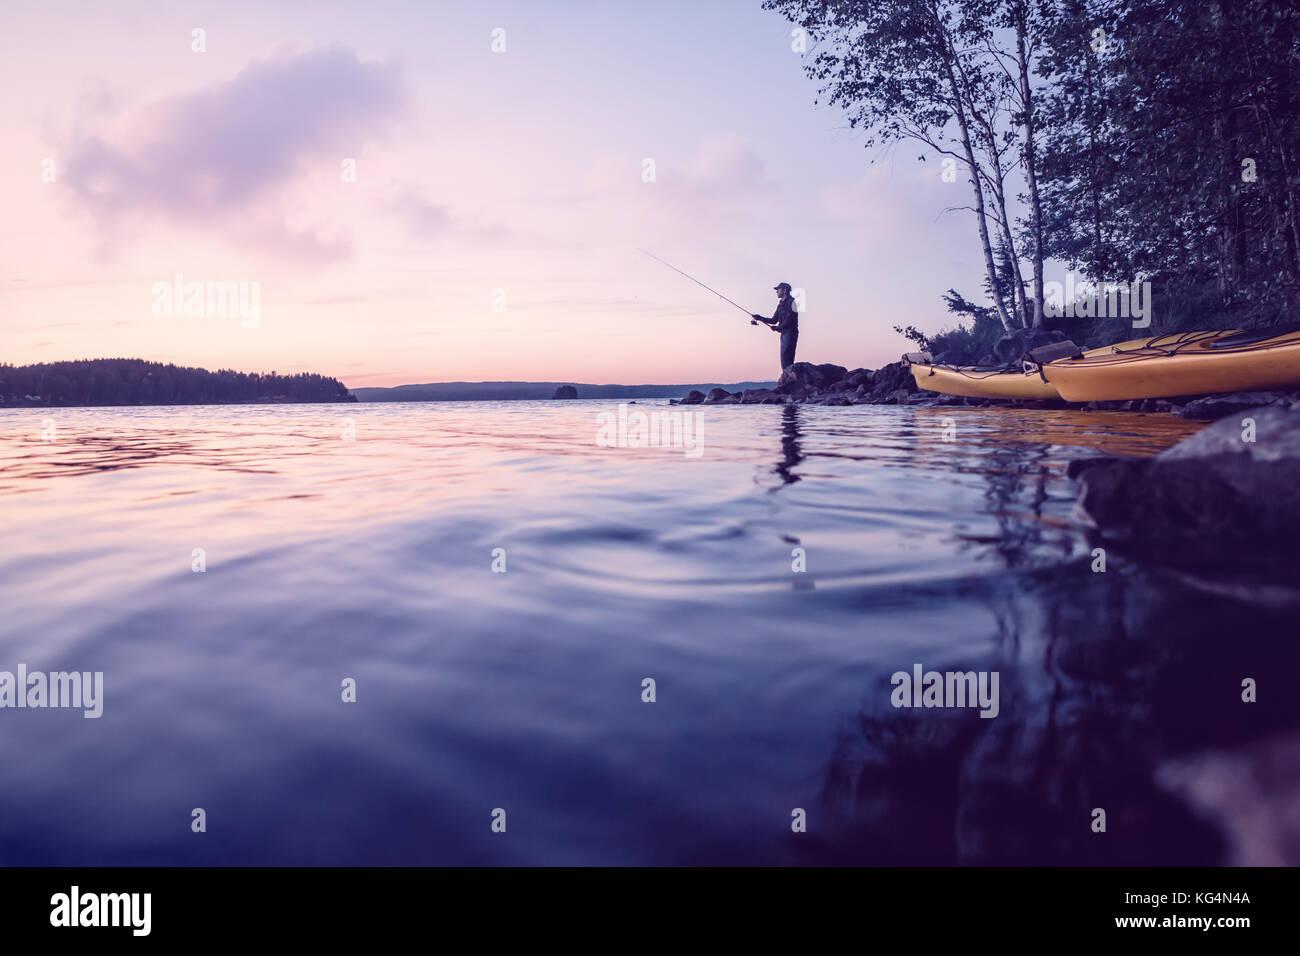 Fishing at a beautiful lake - Stock Image